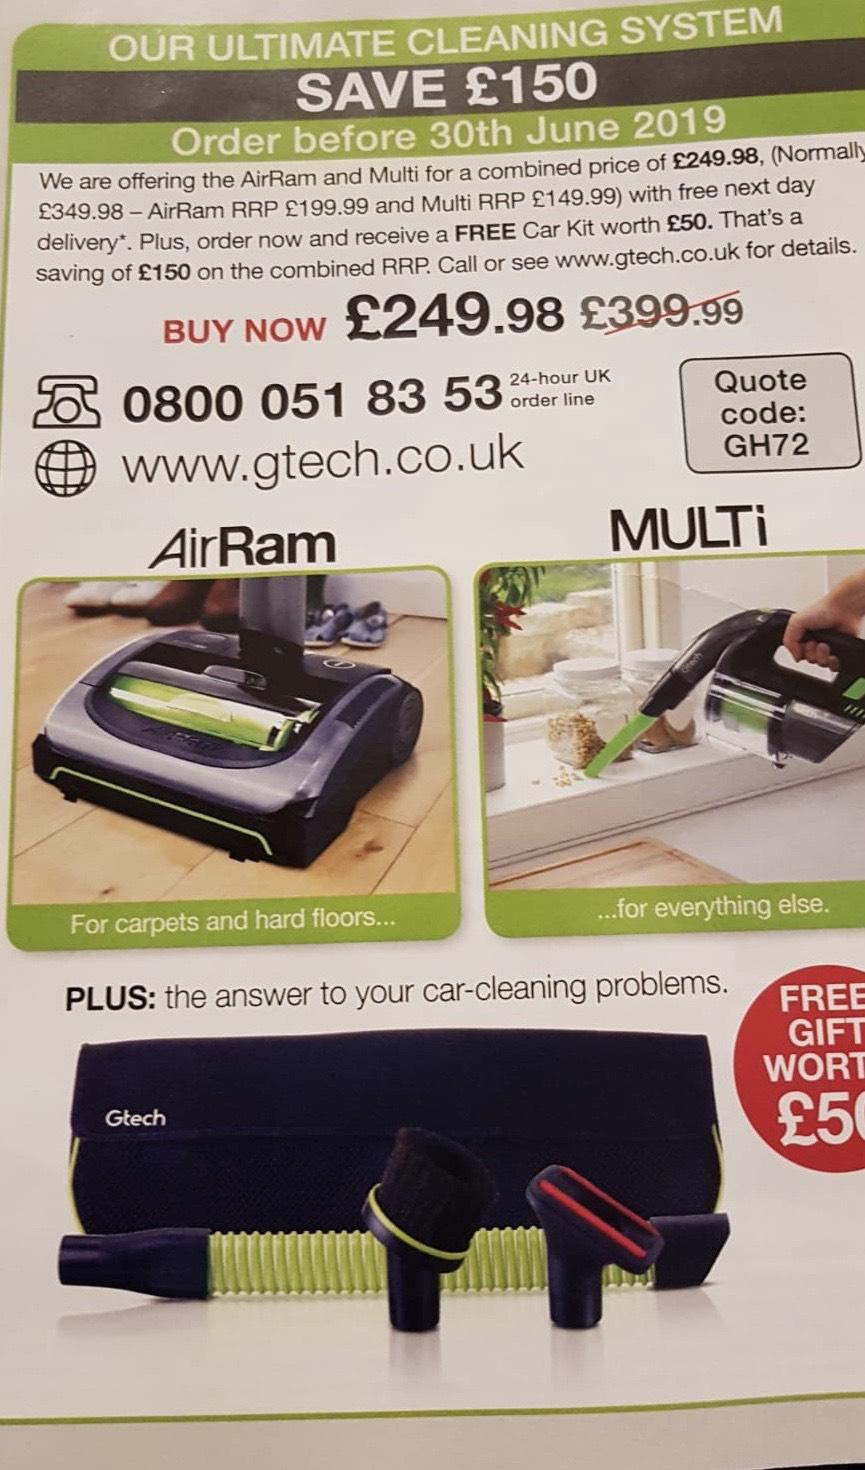 GTech AirRam MK2 + Multi MK2 + Car kit. Combined saving of £150 for £249.98